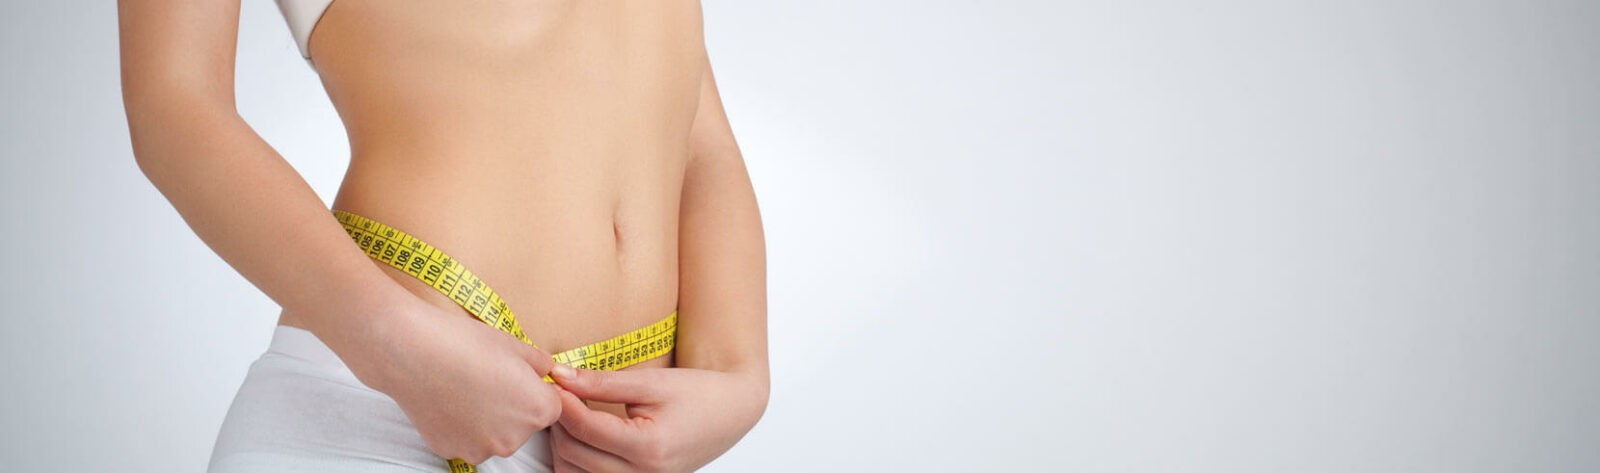 Milwaukee Medical Weight Loss & MediSpa